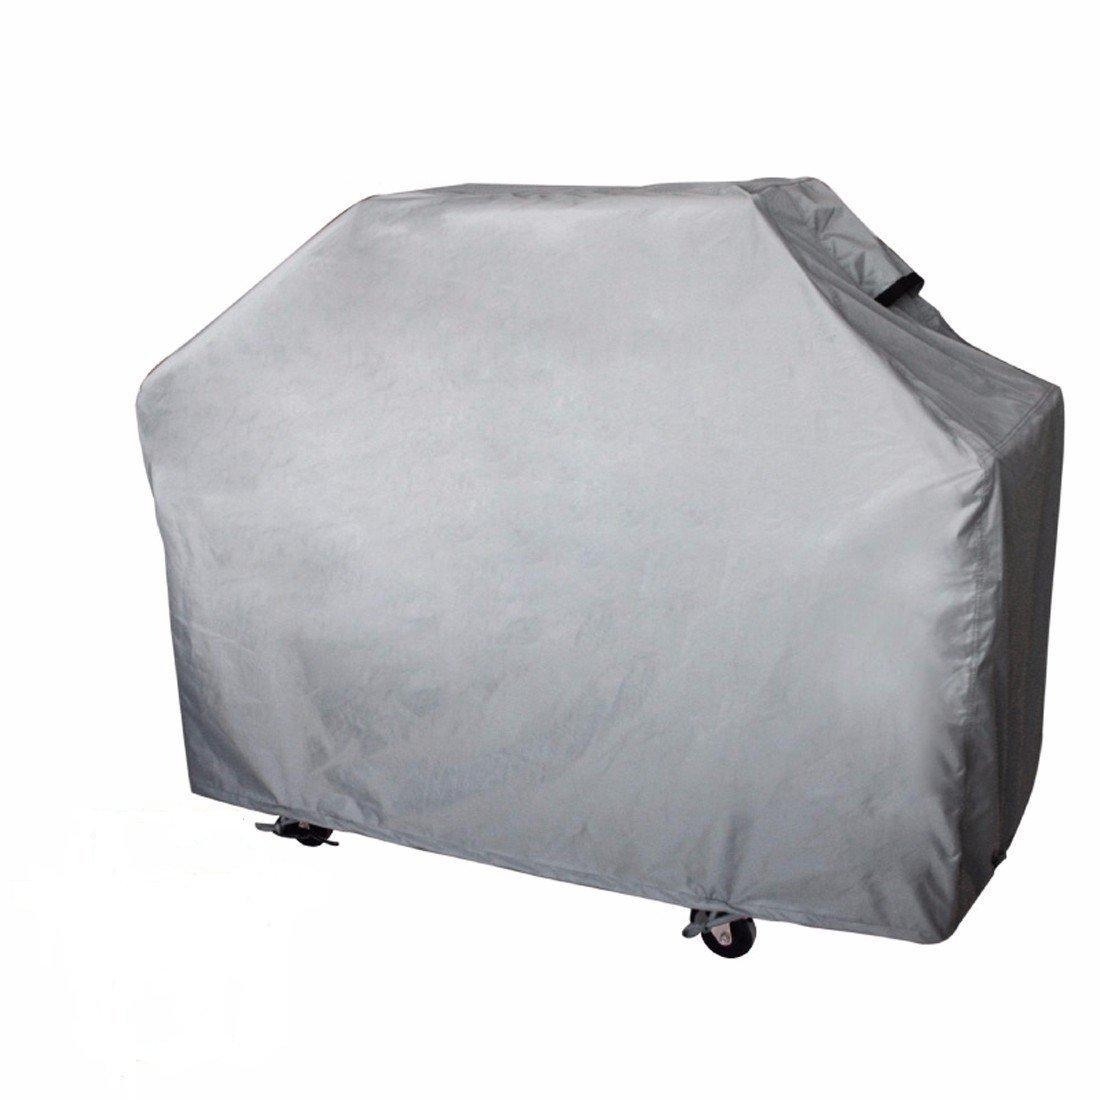 amazon com leader accessories grey heavy duty waterproof outdoor